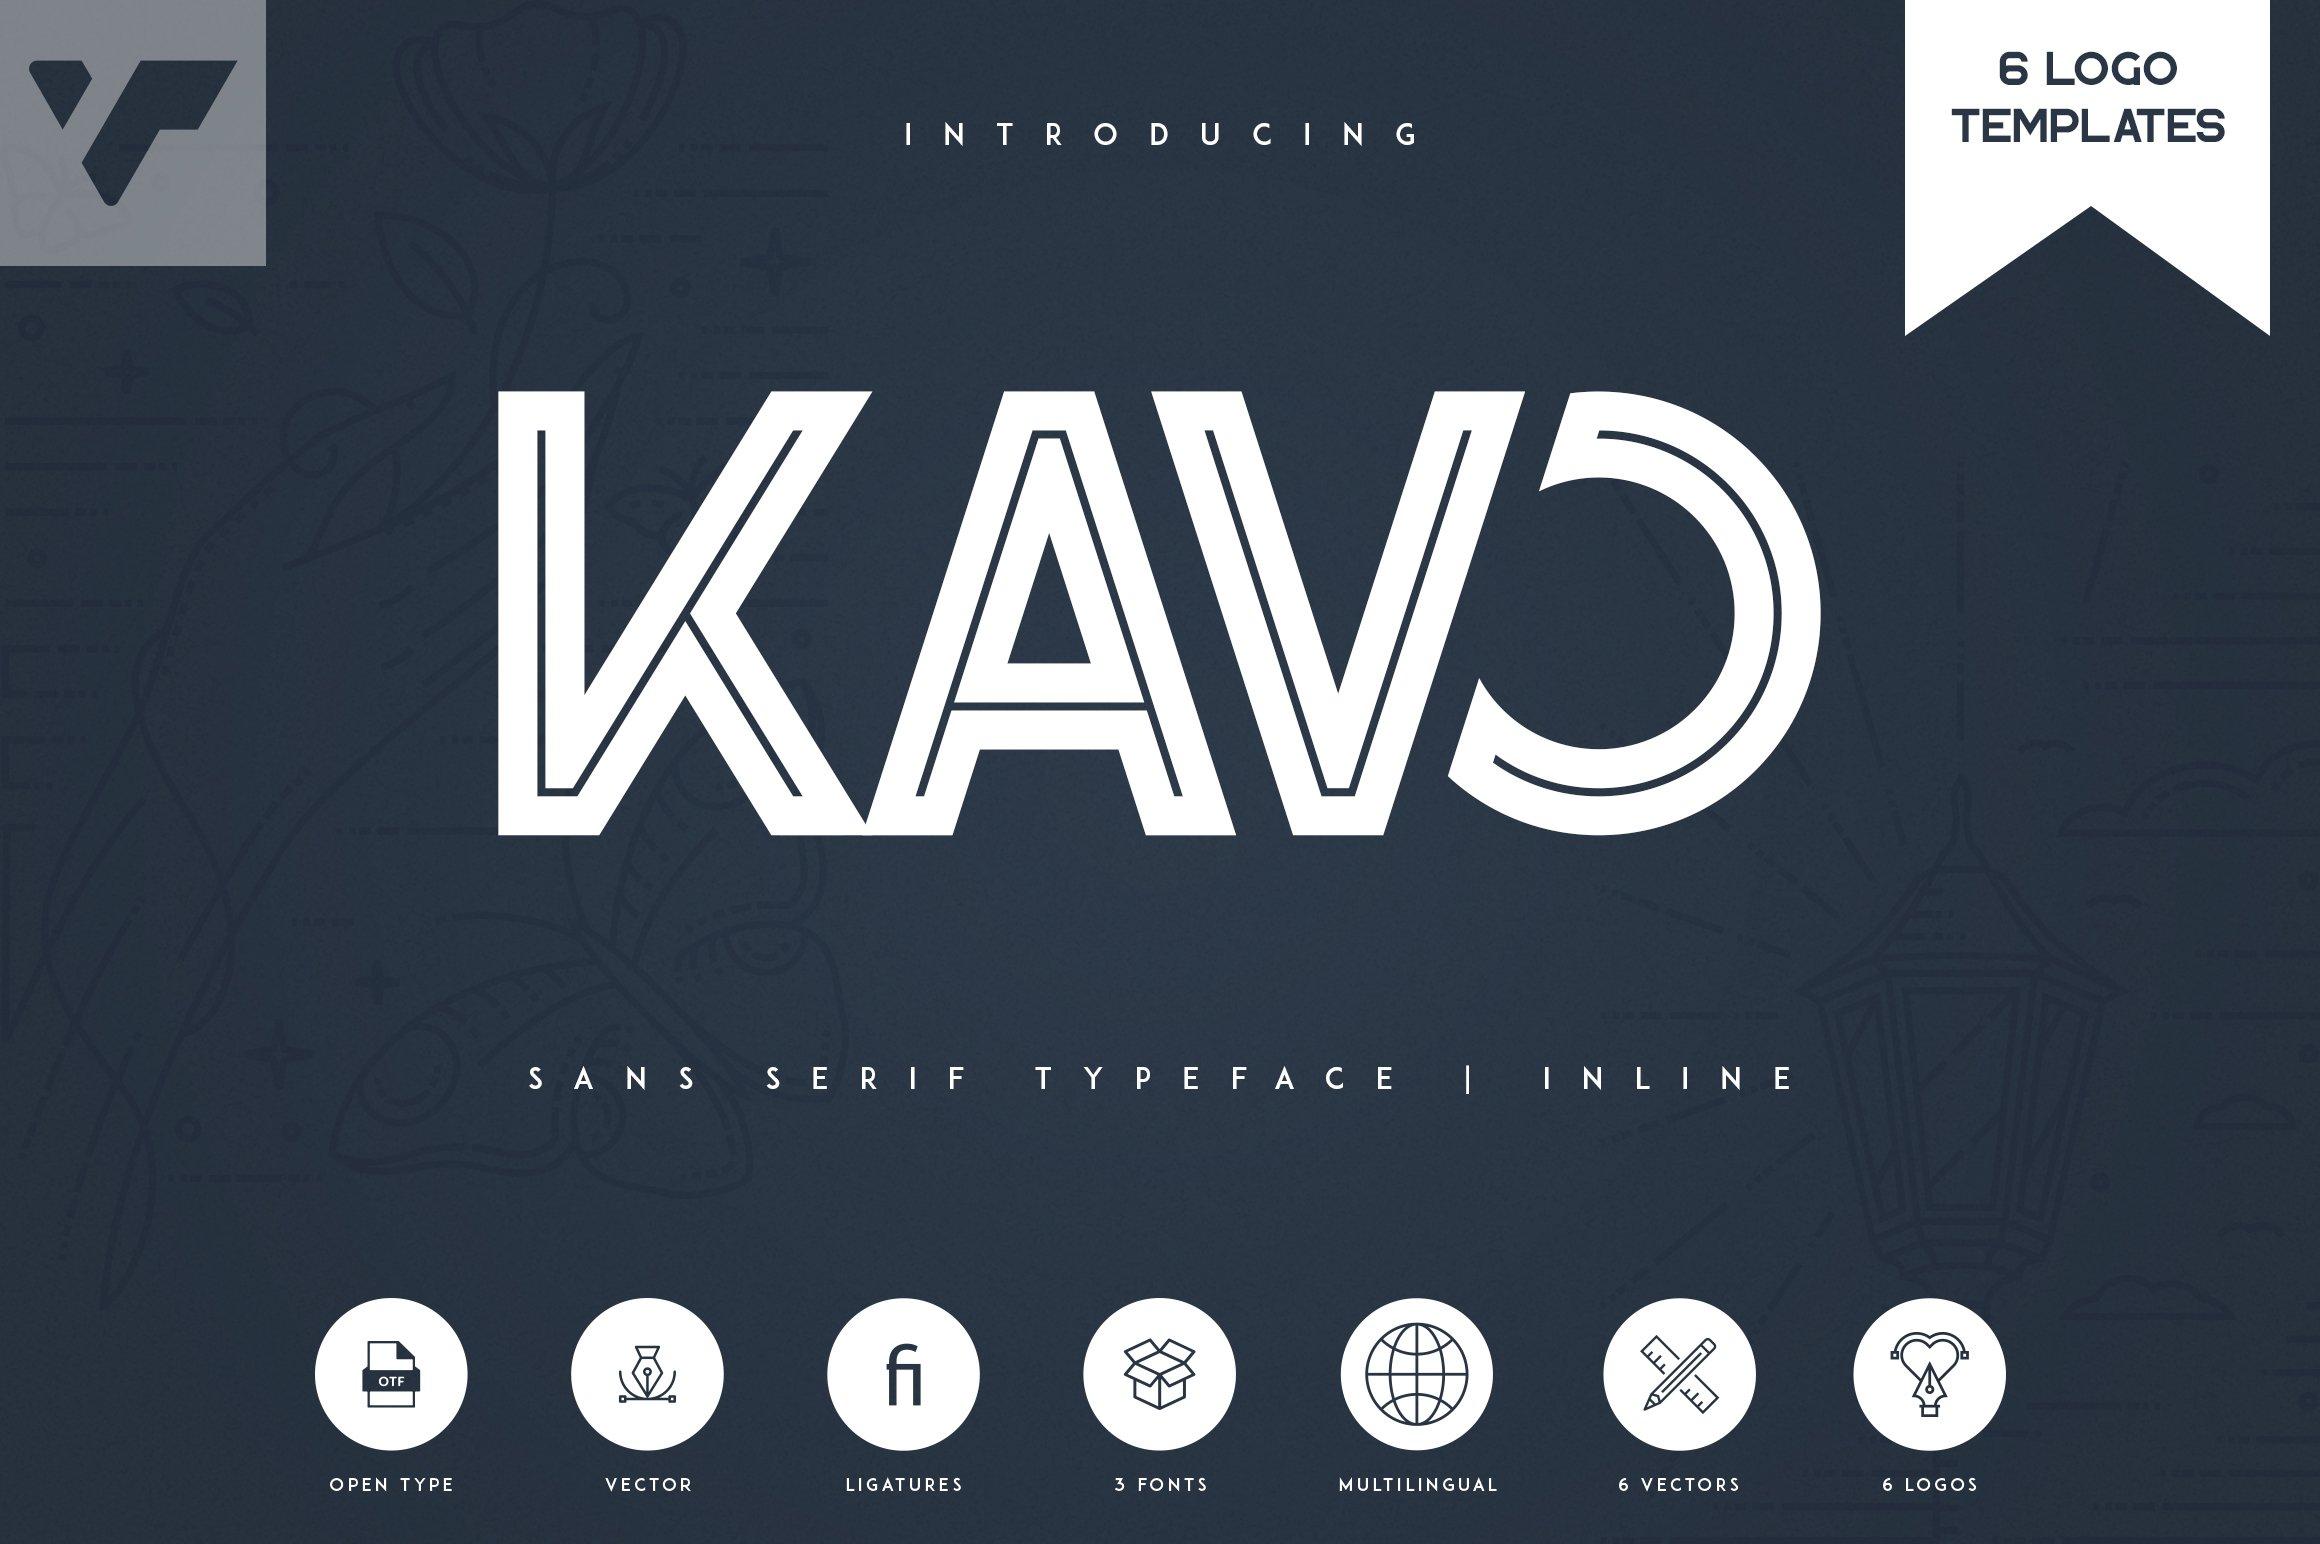 Kavo Inline 6 Logo Templates example image 1